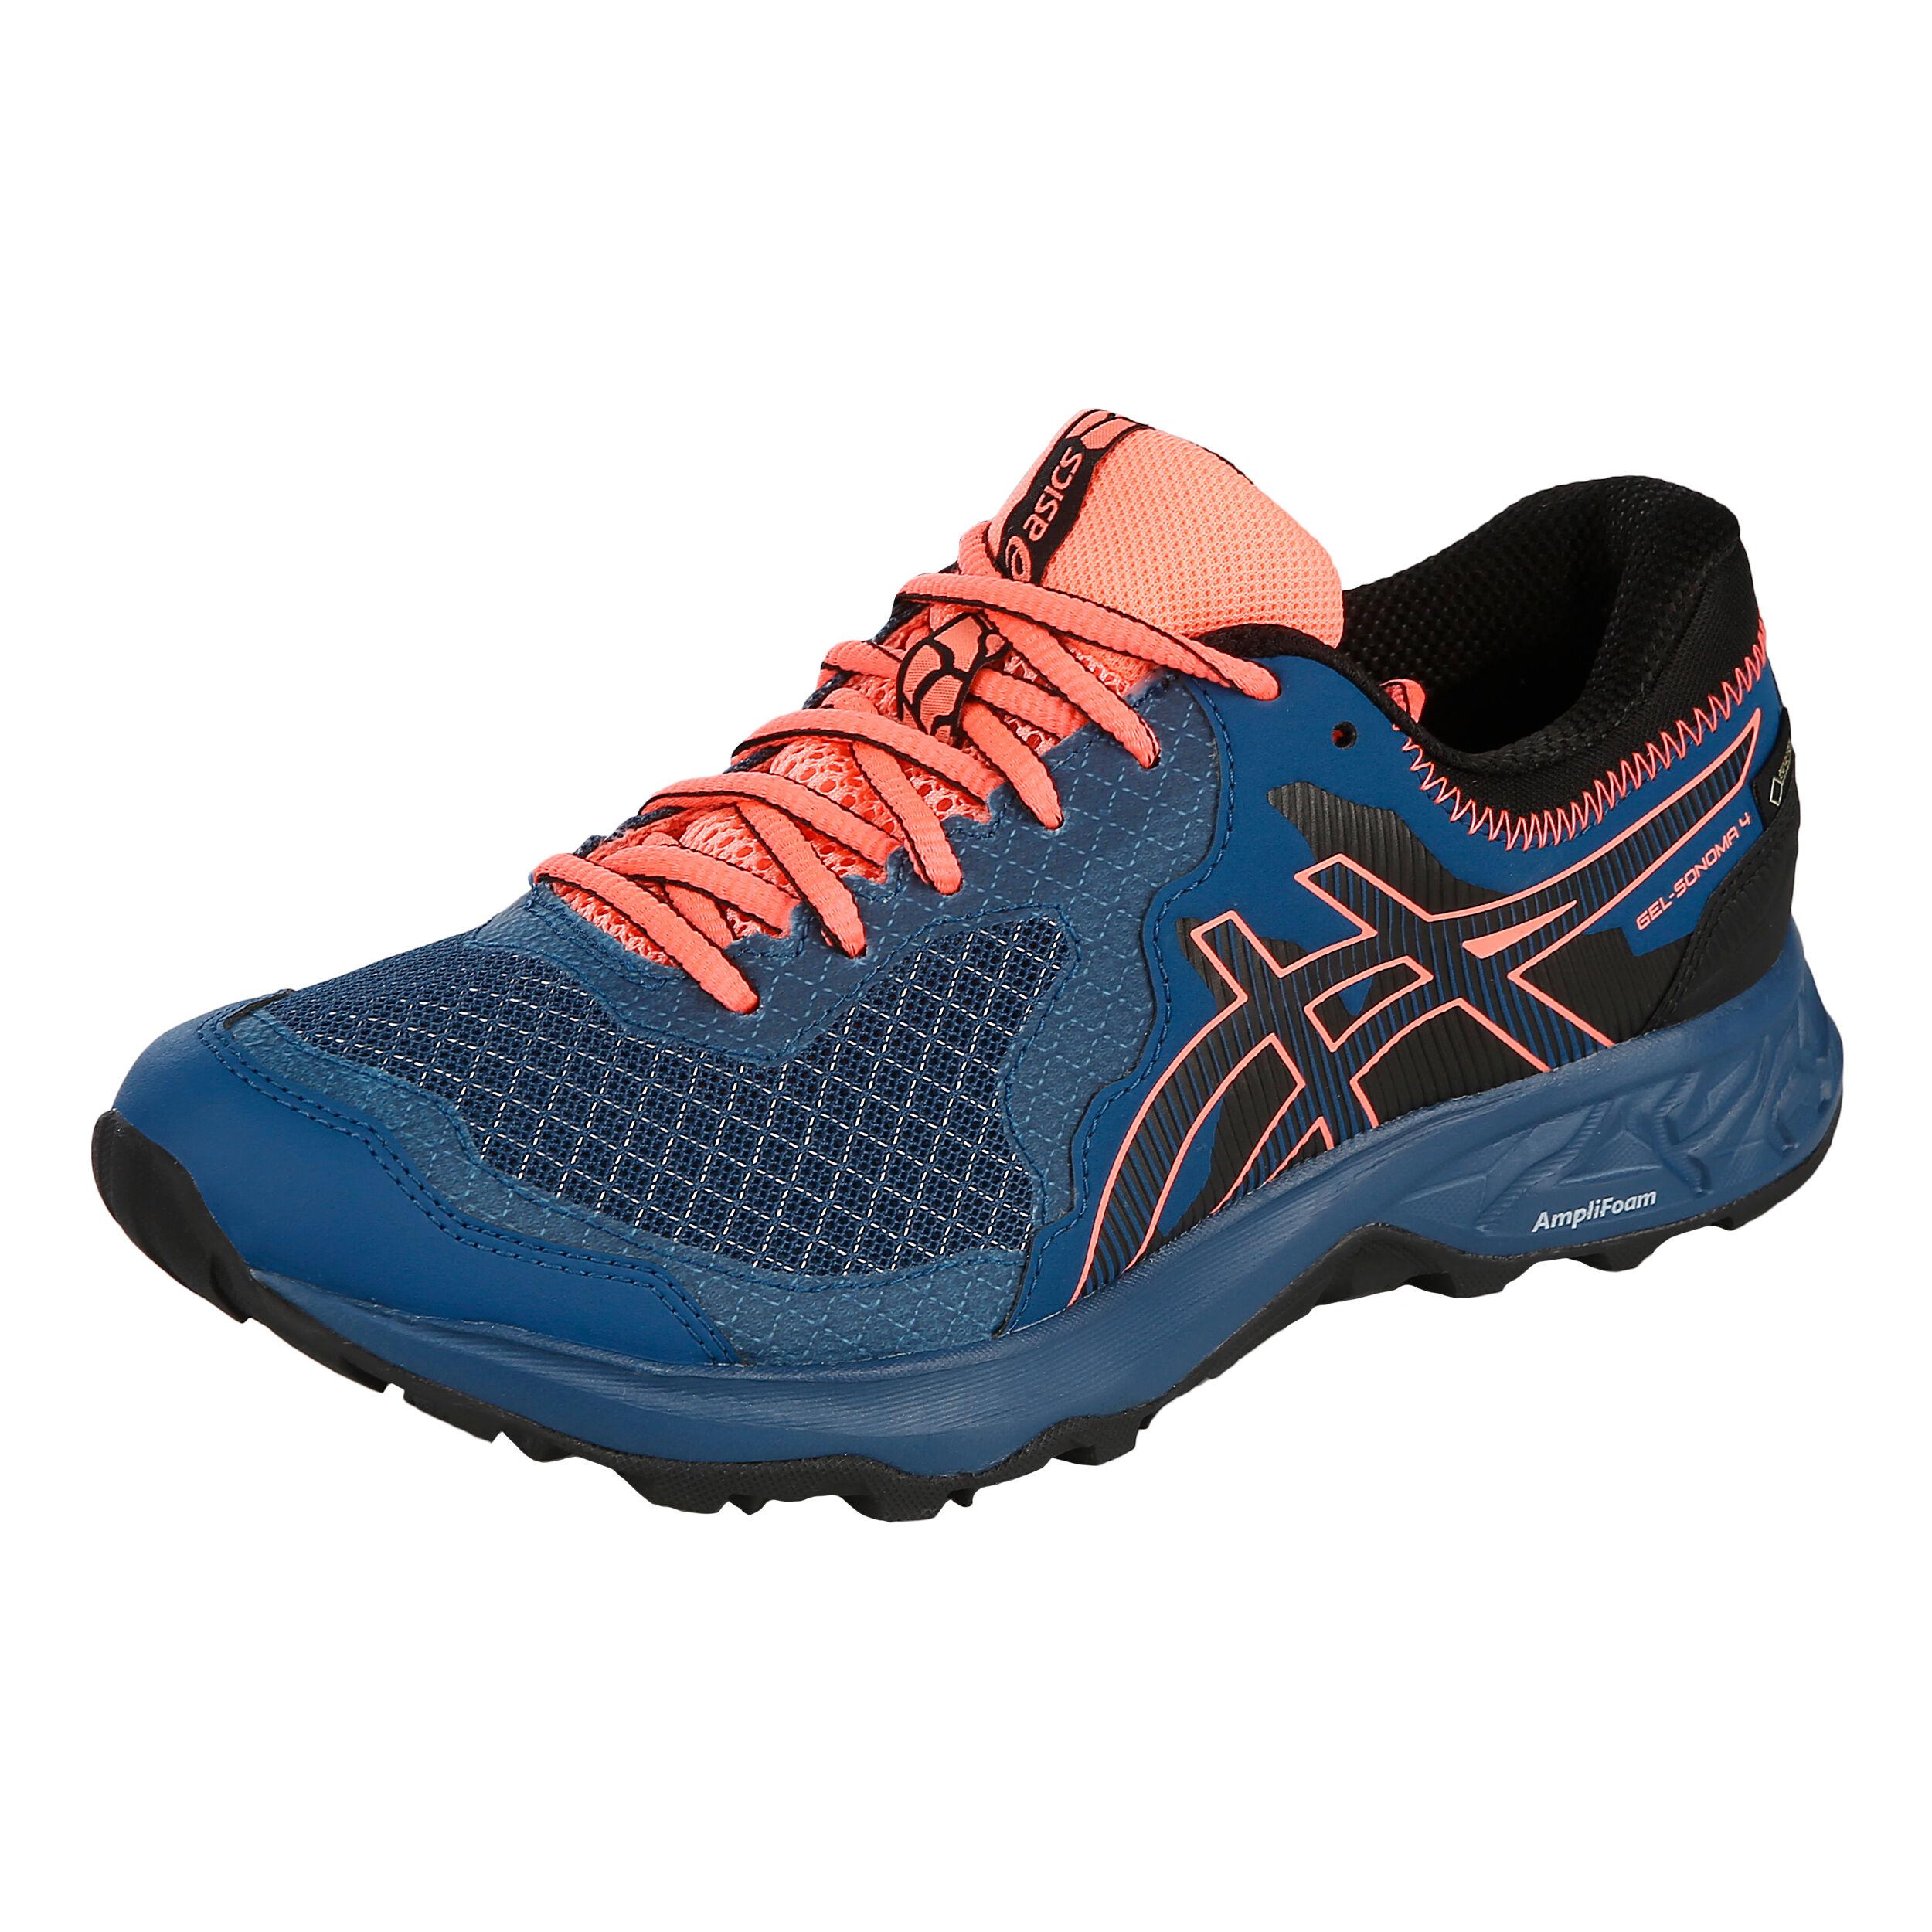 Asics Gel Sonoma 4 GTX Trail Running Shoe Women Petrol, Coral